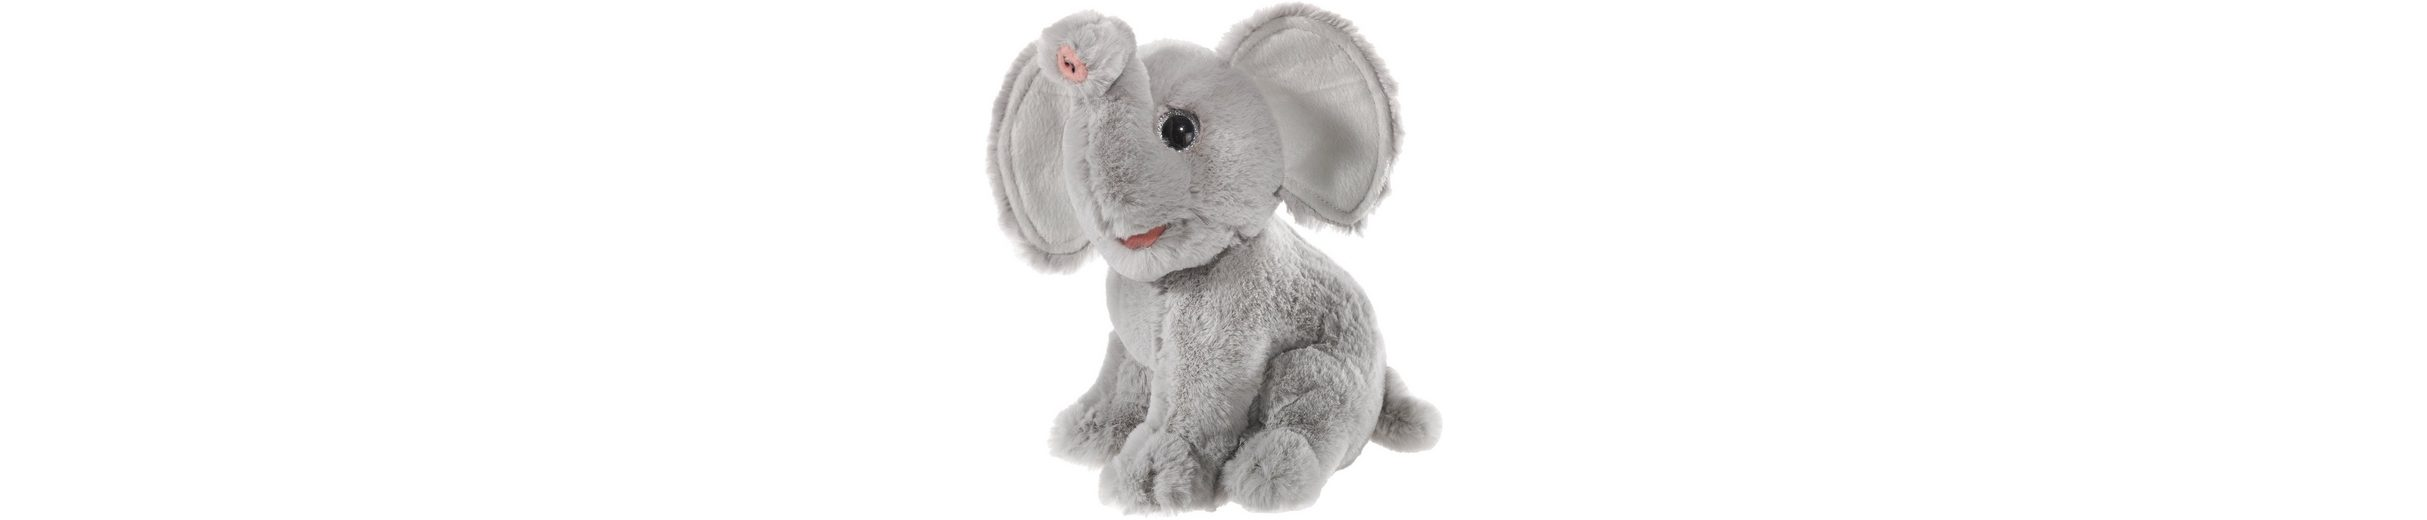 Heunec Kuscheltier, »Mi Classico, Elefant«